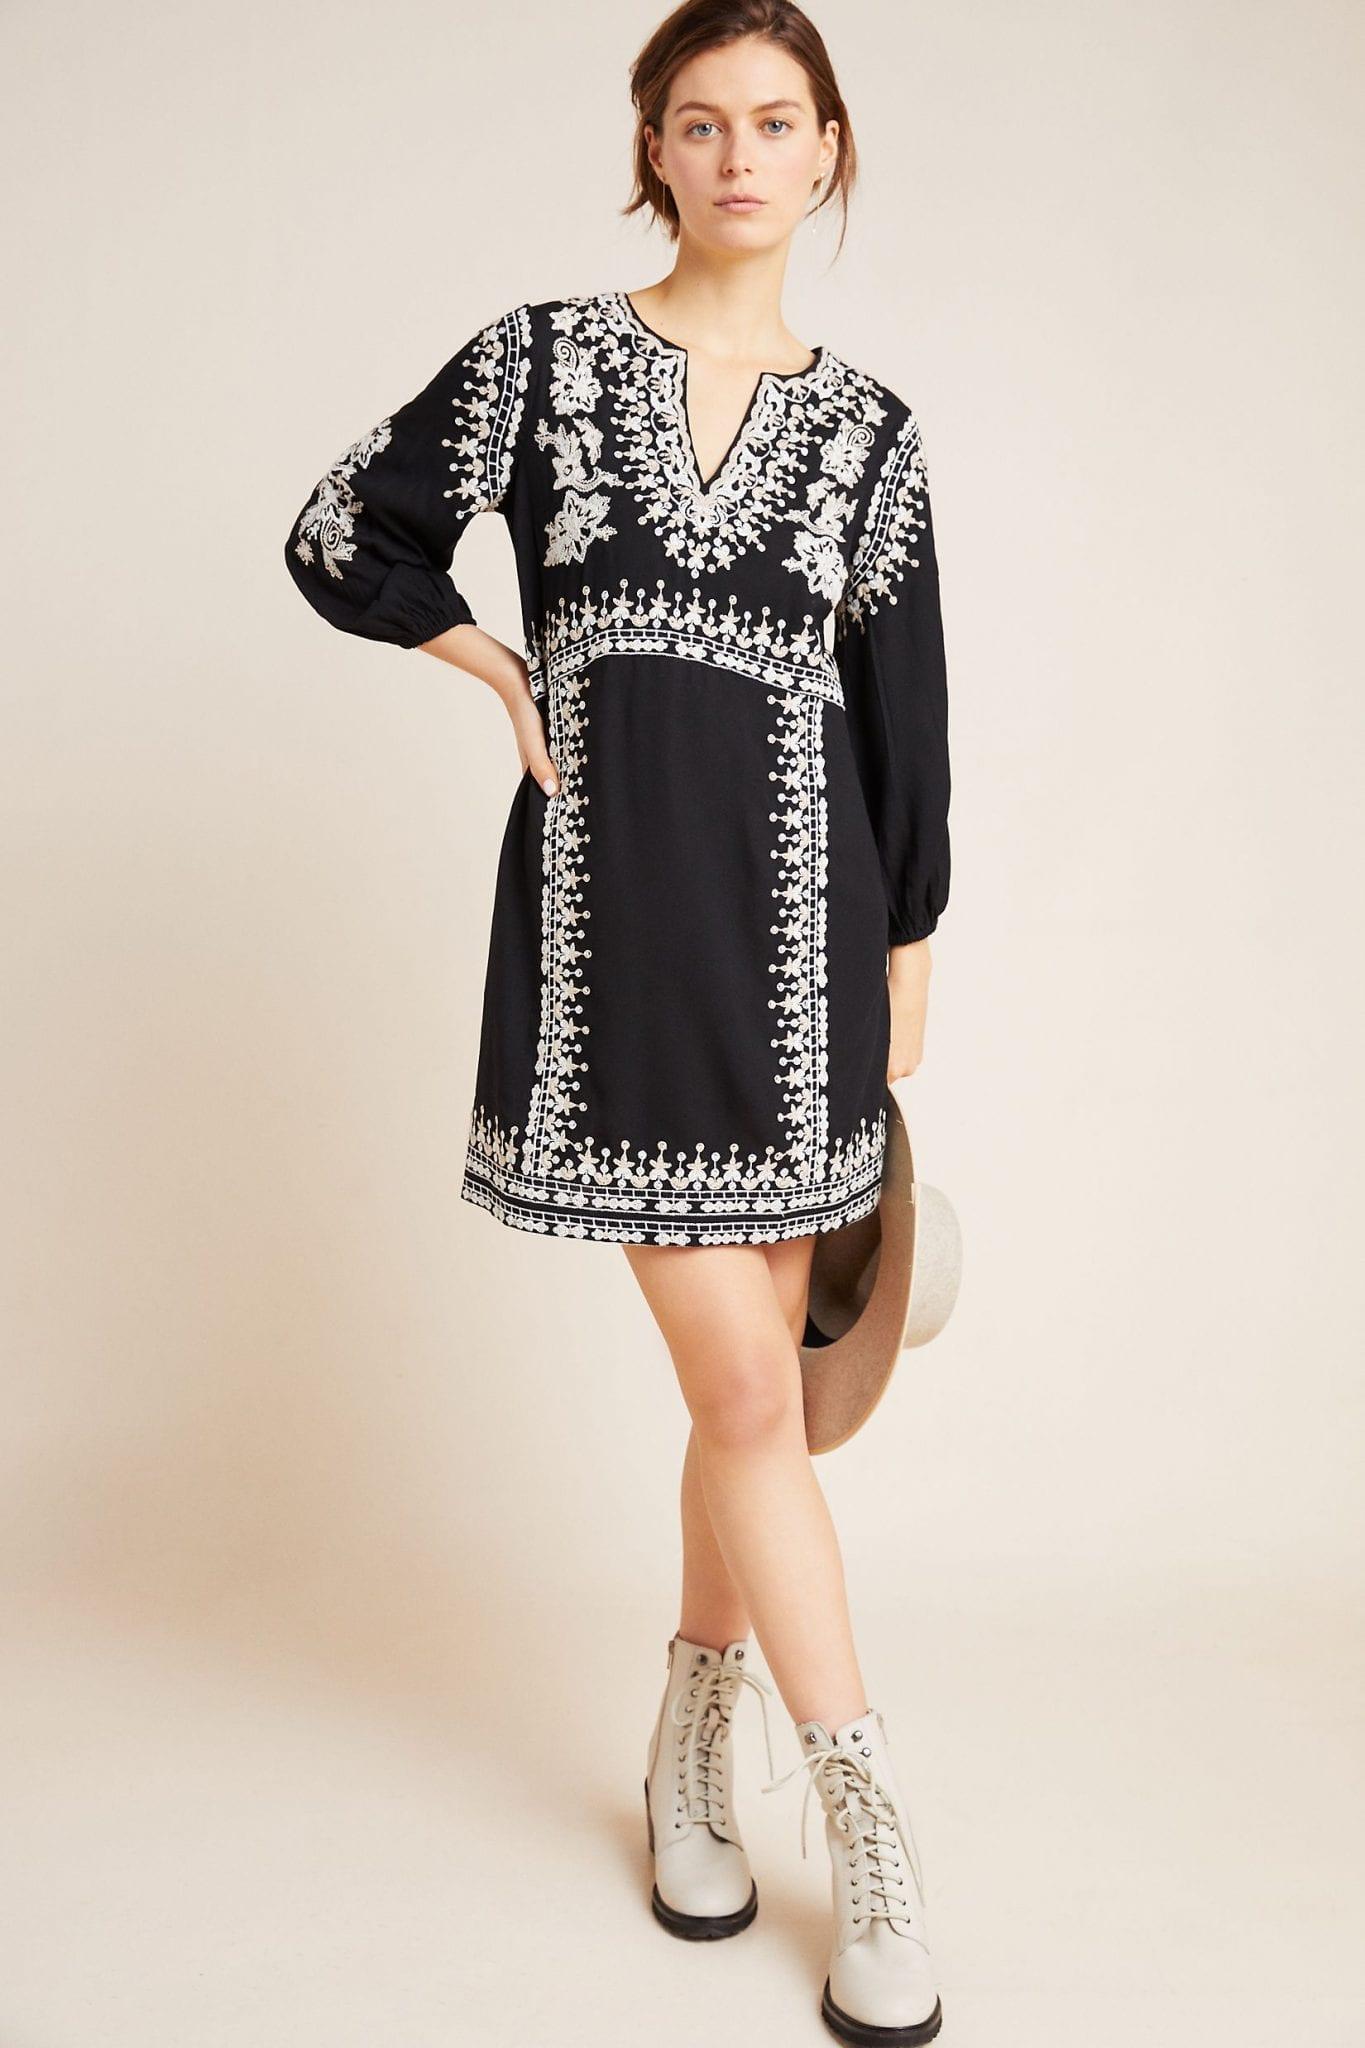 MAEVE Shiloh Embroidered Tunic Dress